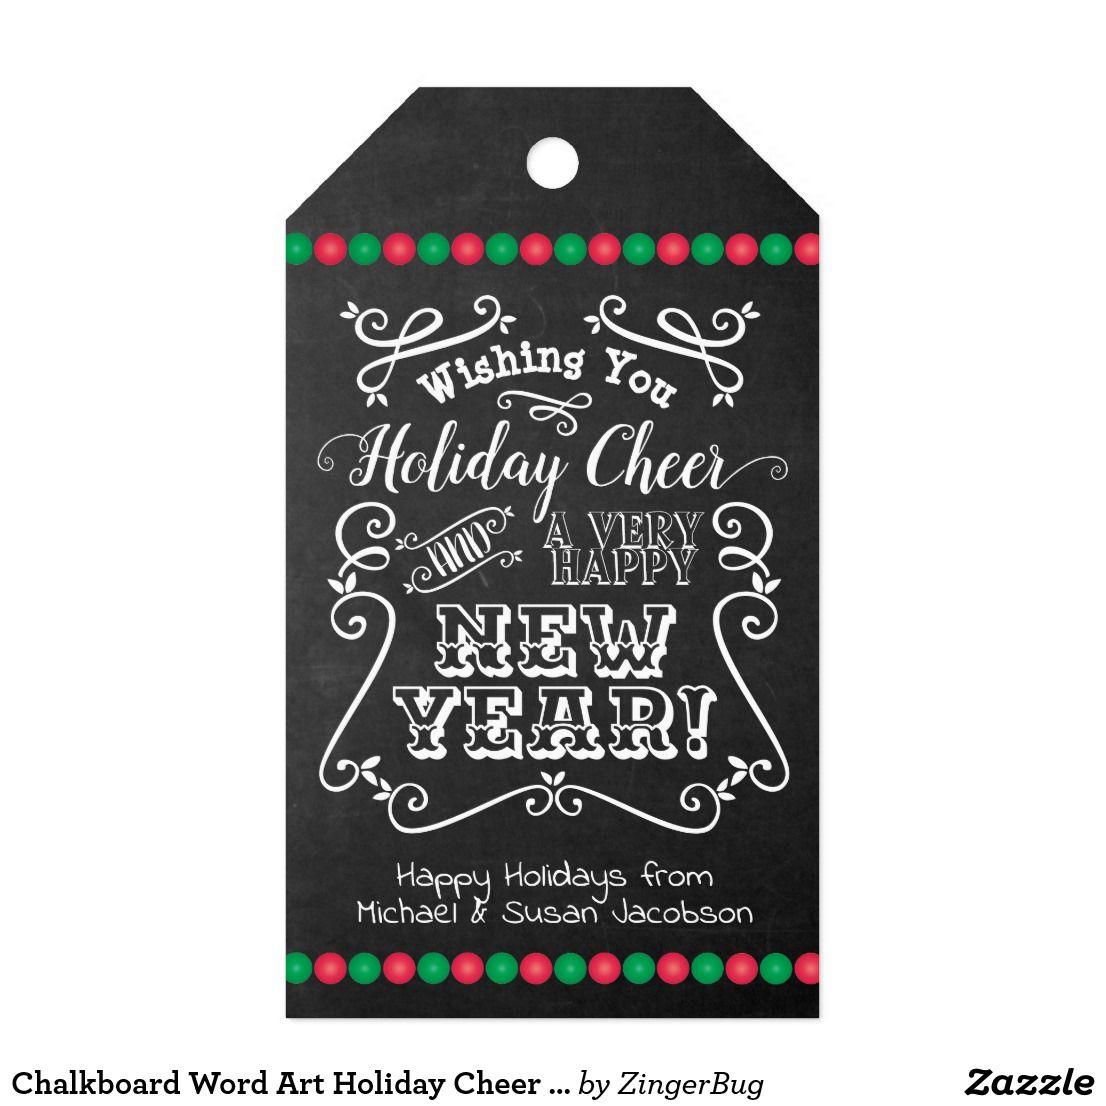 Chalkboard Word Art Holiday Cheer Happy New Year Gift Tags